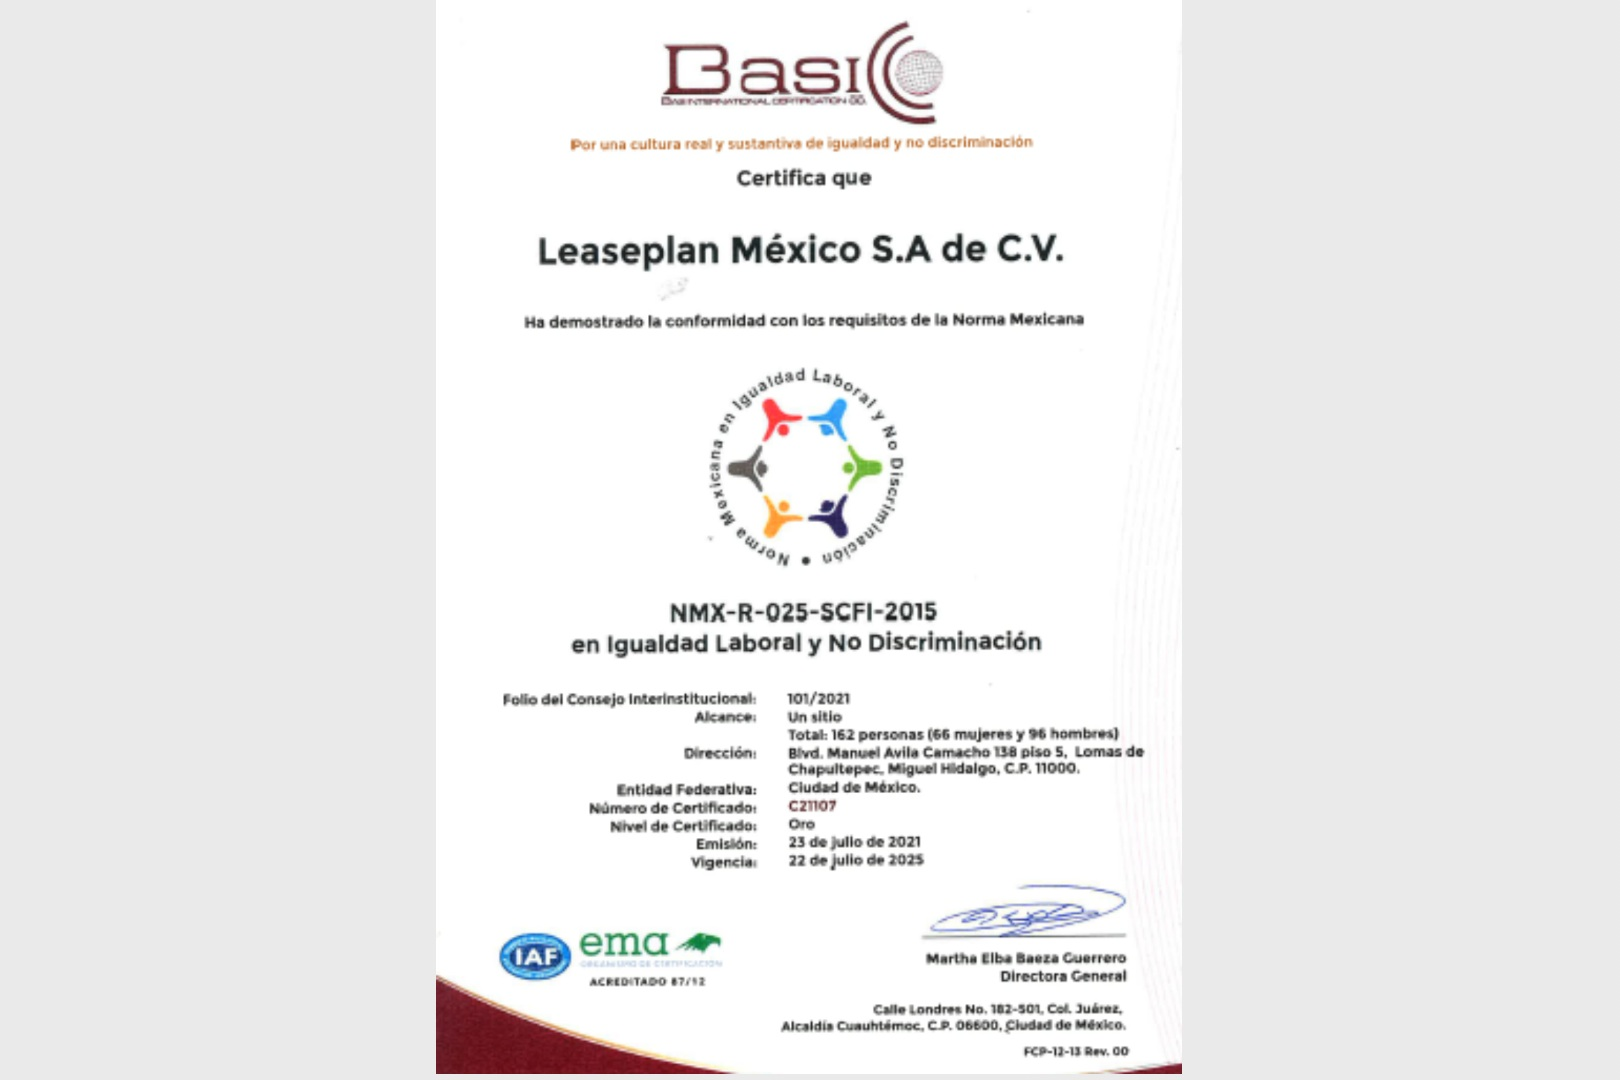 LeasePlan México